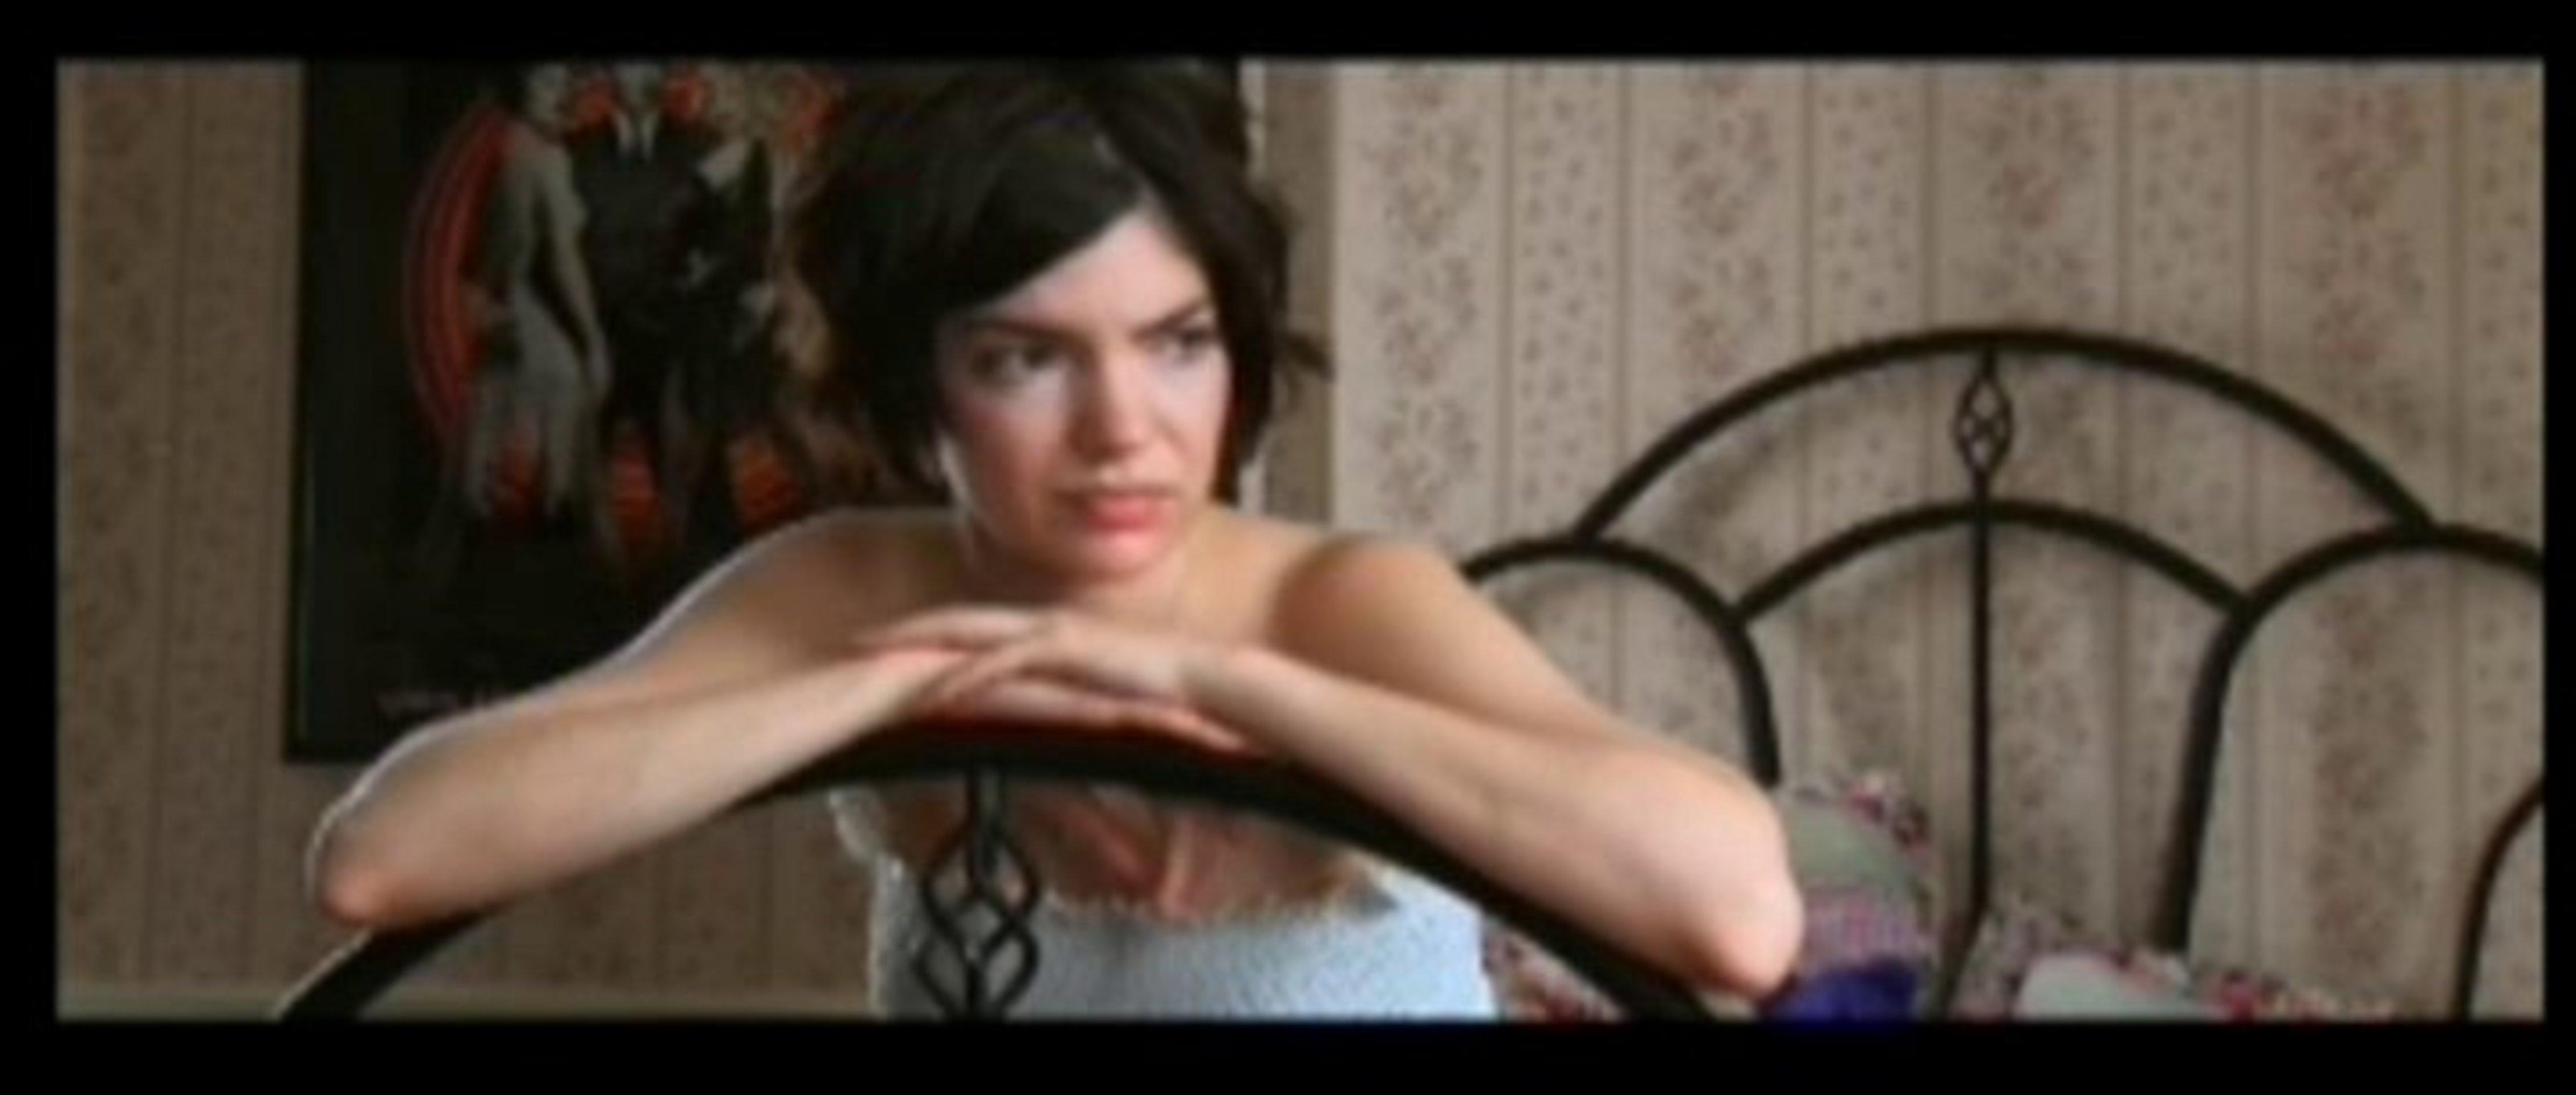 MAFS' Sarah Roza accuses Telv Williams of 'hooking up with randoms'